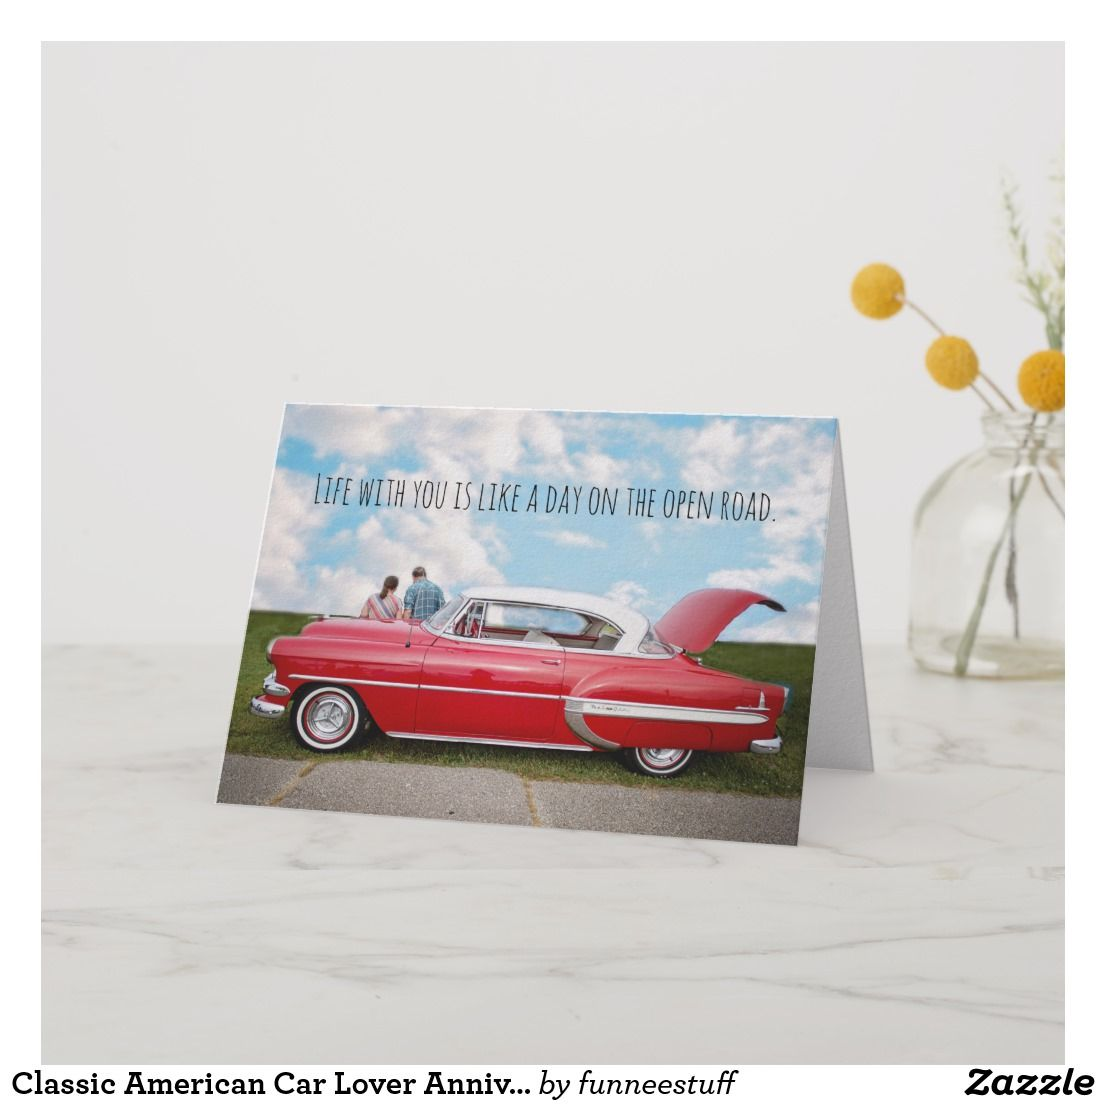 Classic American Car Lover Anniversary Card